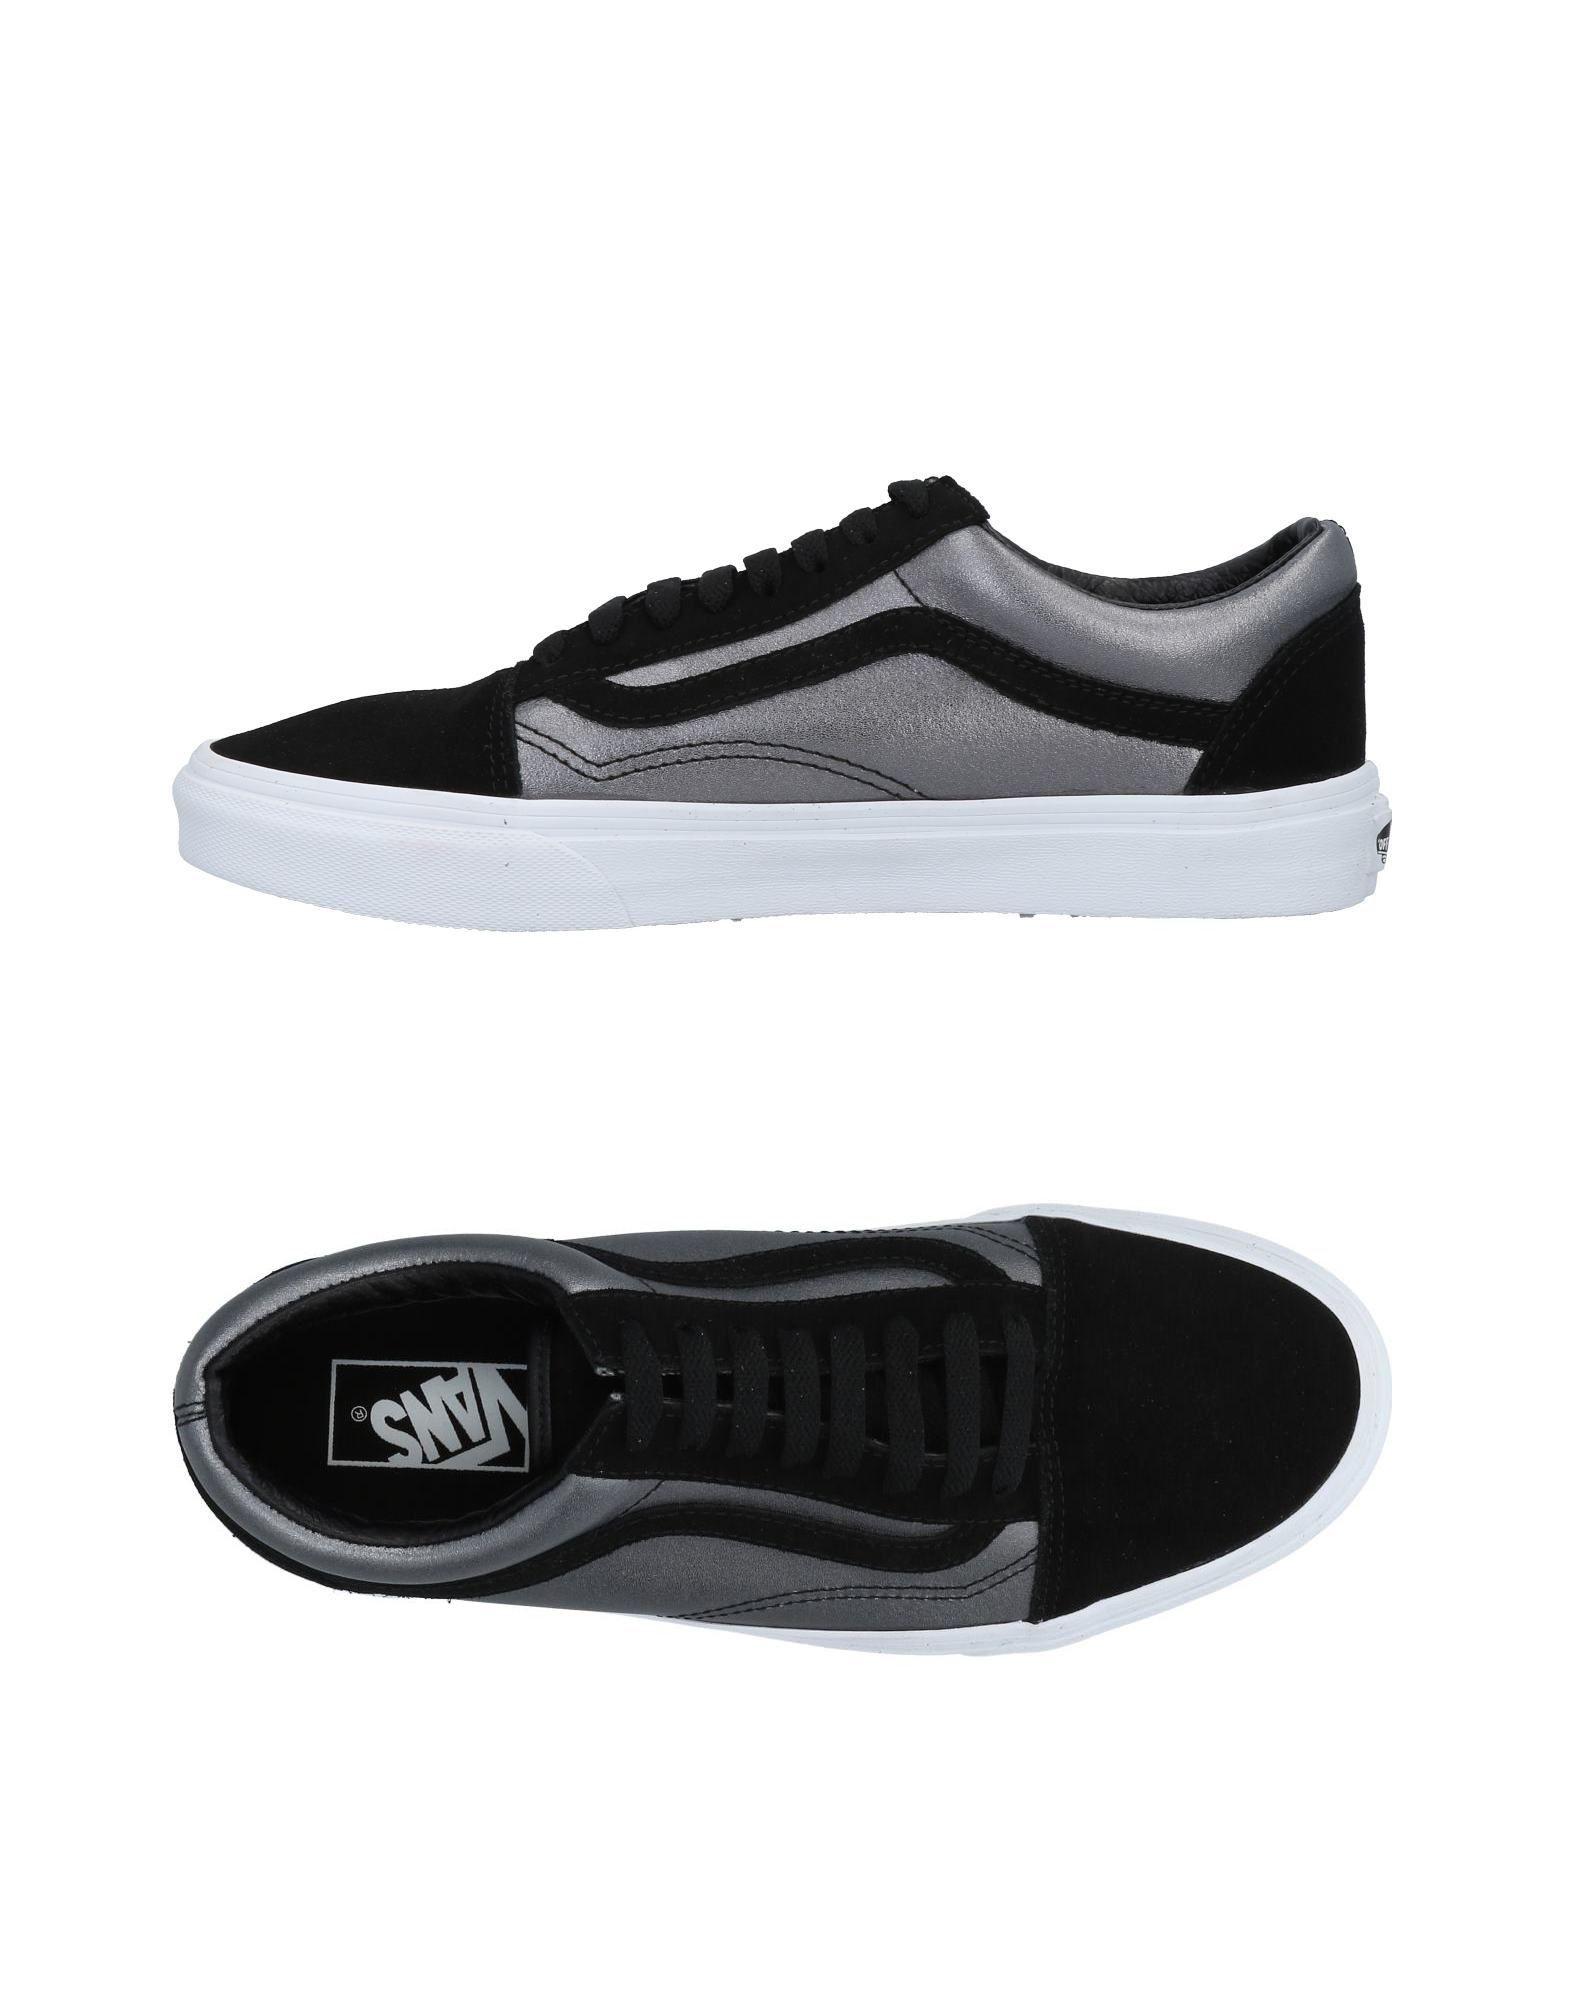 Vans Sneakers - Men Vans Sneakers online on  Australia Australia Australia - 11492442AA 715040